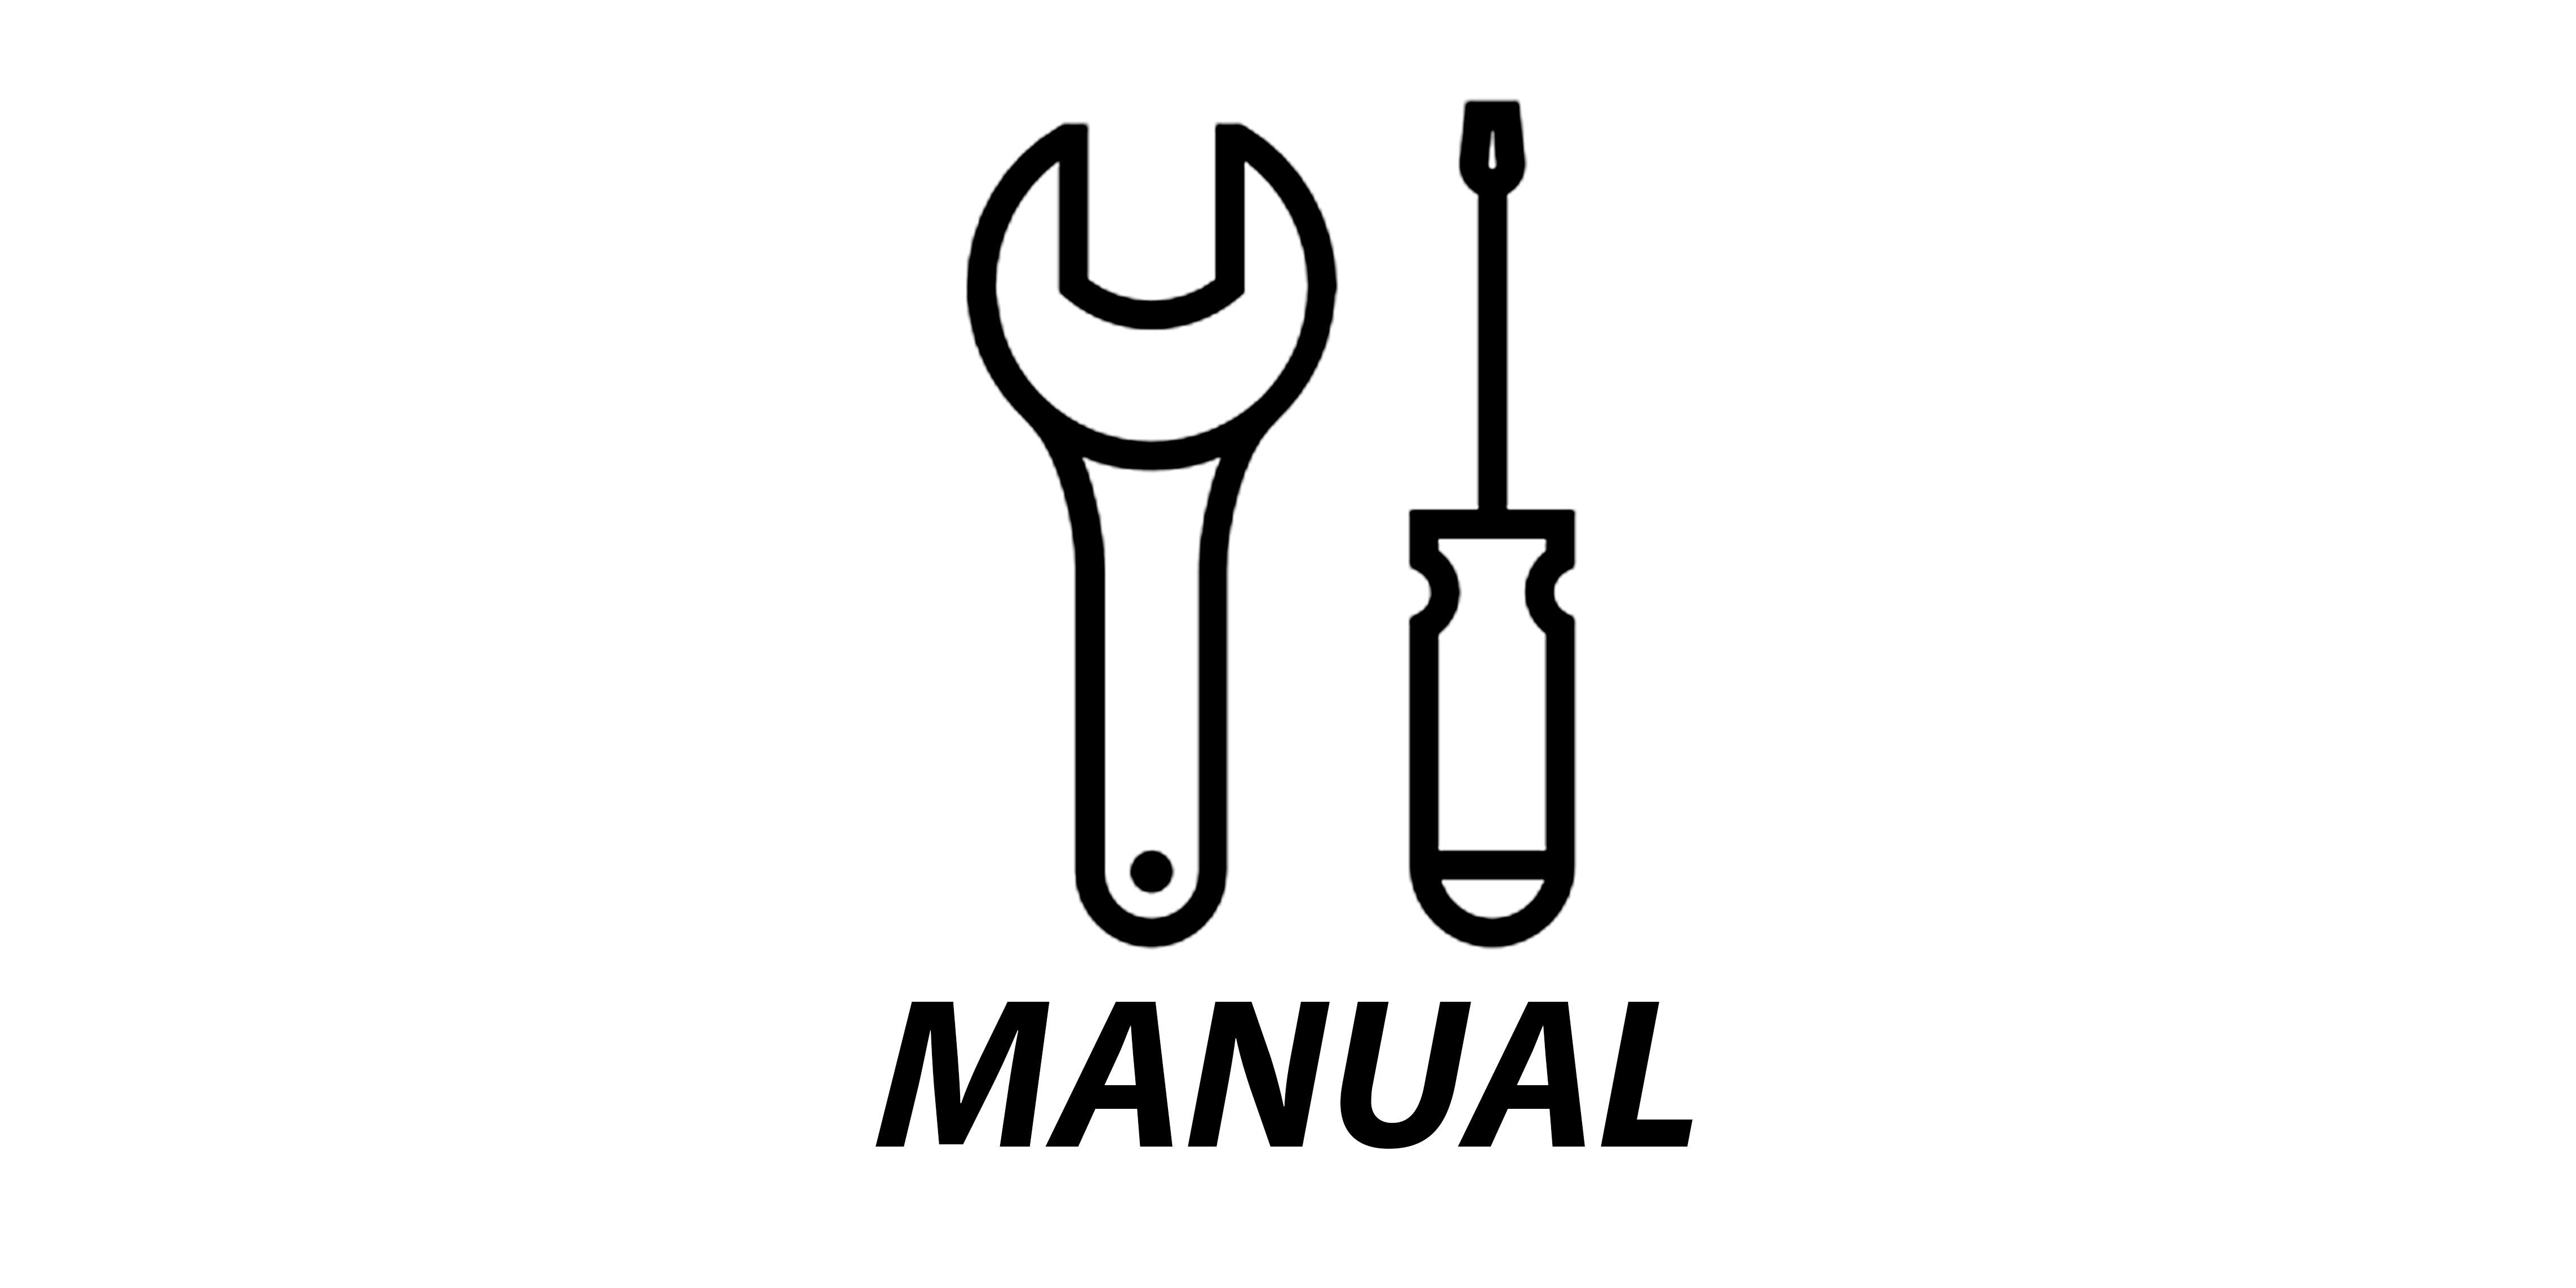 Herramienta Manual en Ser Viso Mex